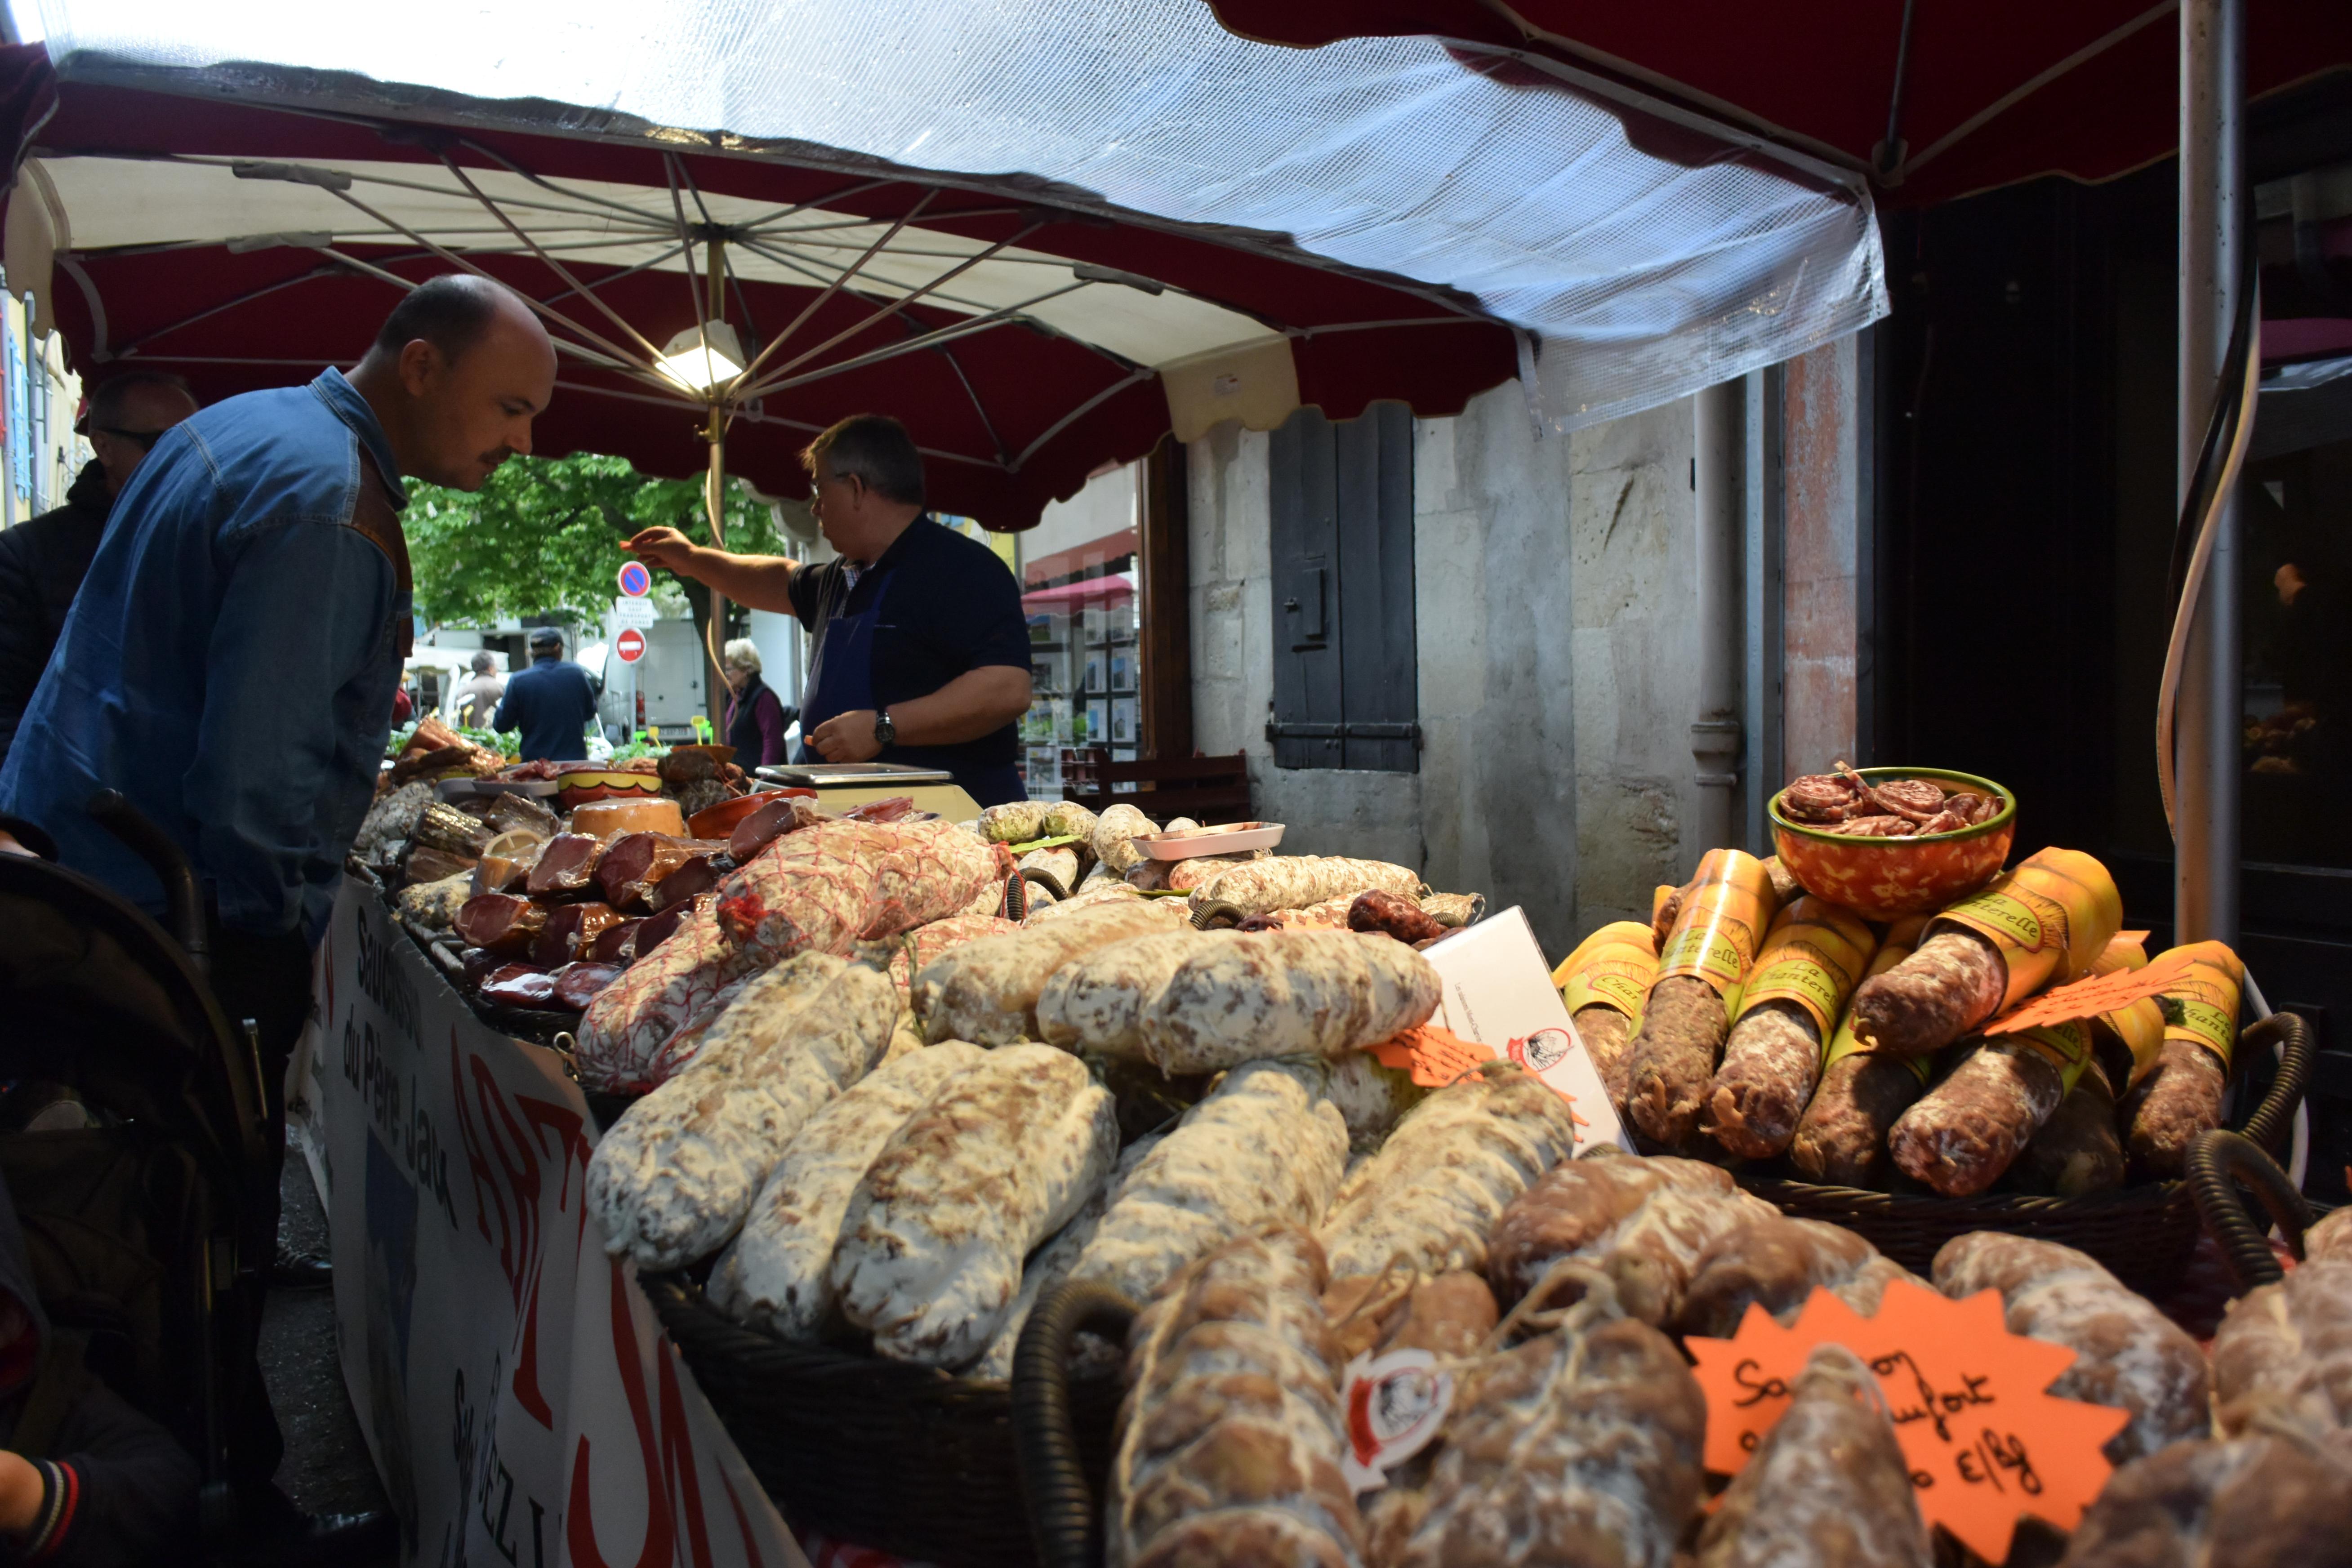 Meat Vendor at Market